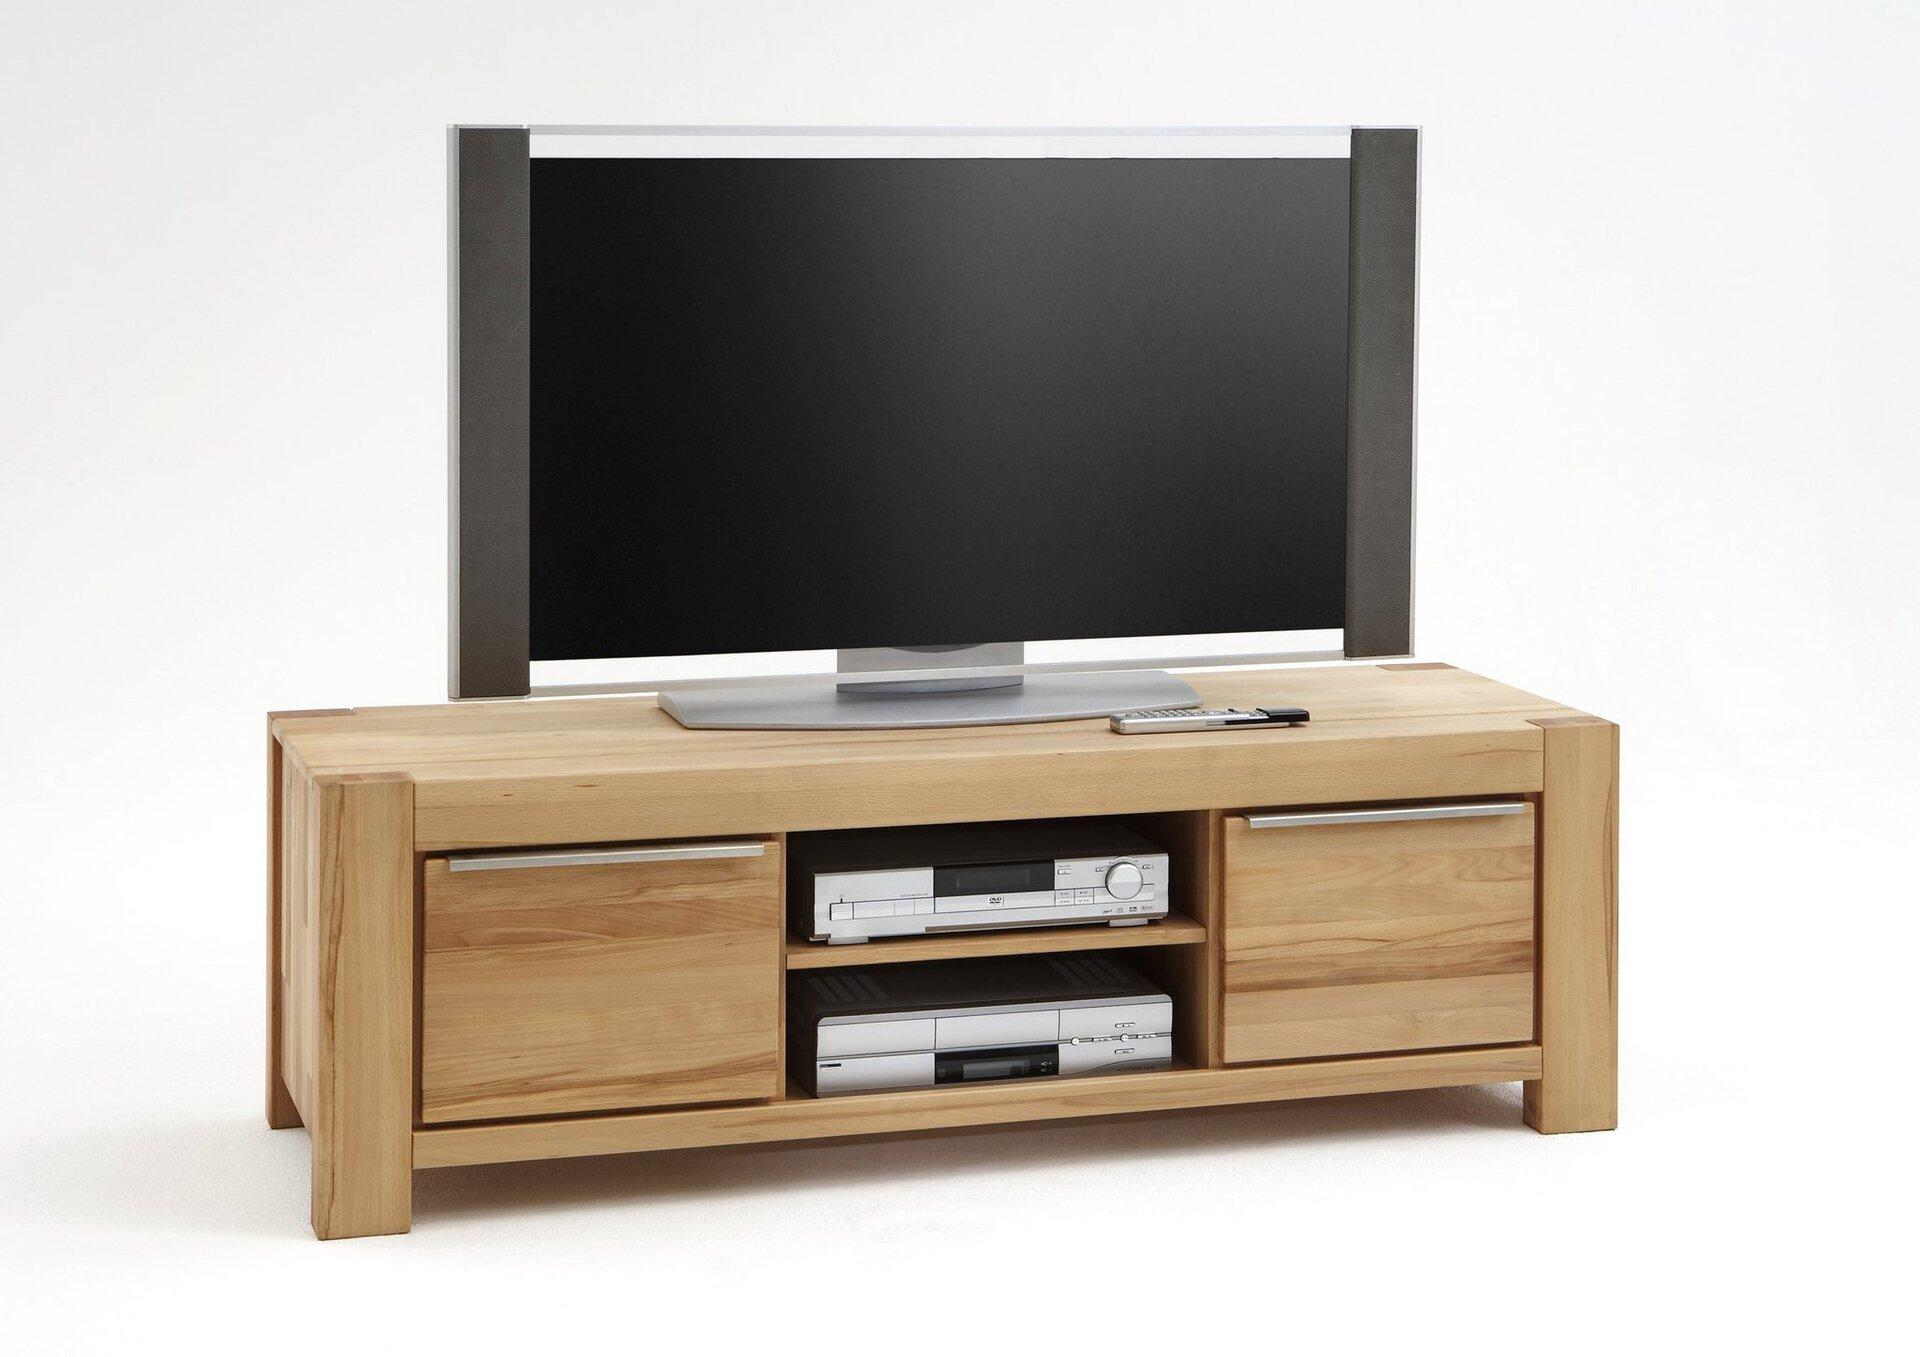 Kommode NENA CELECT Holzwerkstoff braun 50 x 53 x 155 cm